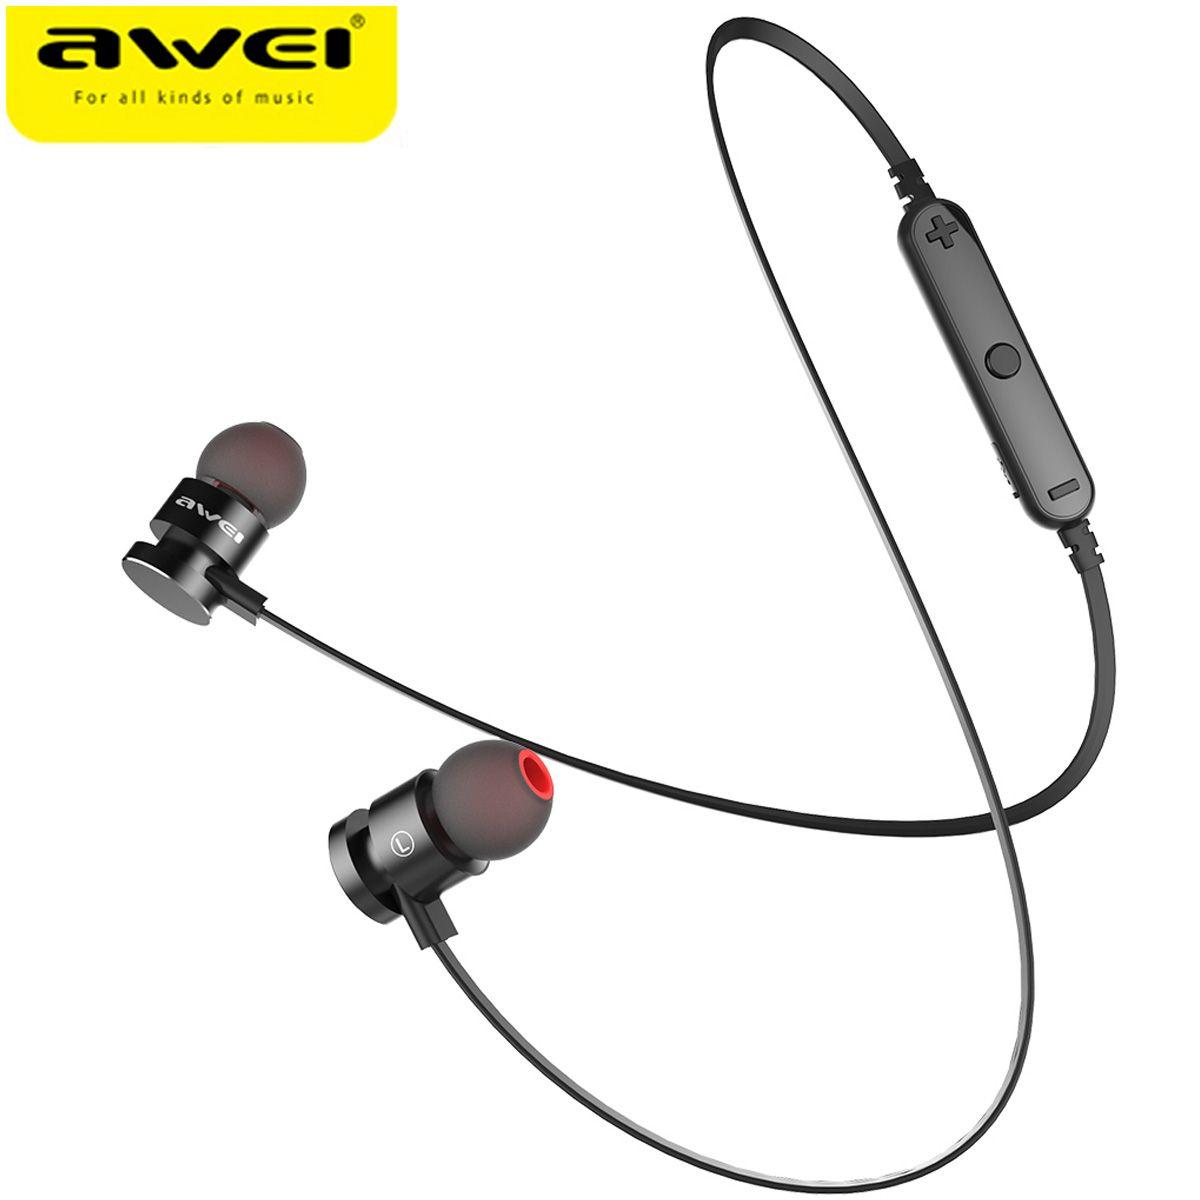 2017 neueste AWEI T11 Drahtlose Kopfhörer Bluetooth Kopfhörer Fone de ouvido Für Telefon Nackenbügel Écouteur Auriculares Bluetooth V4.2